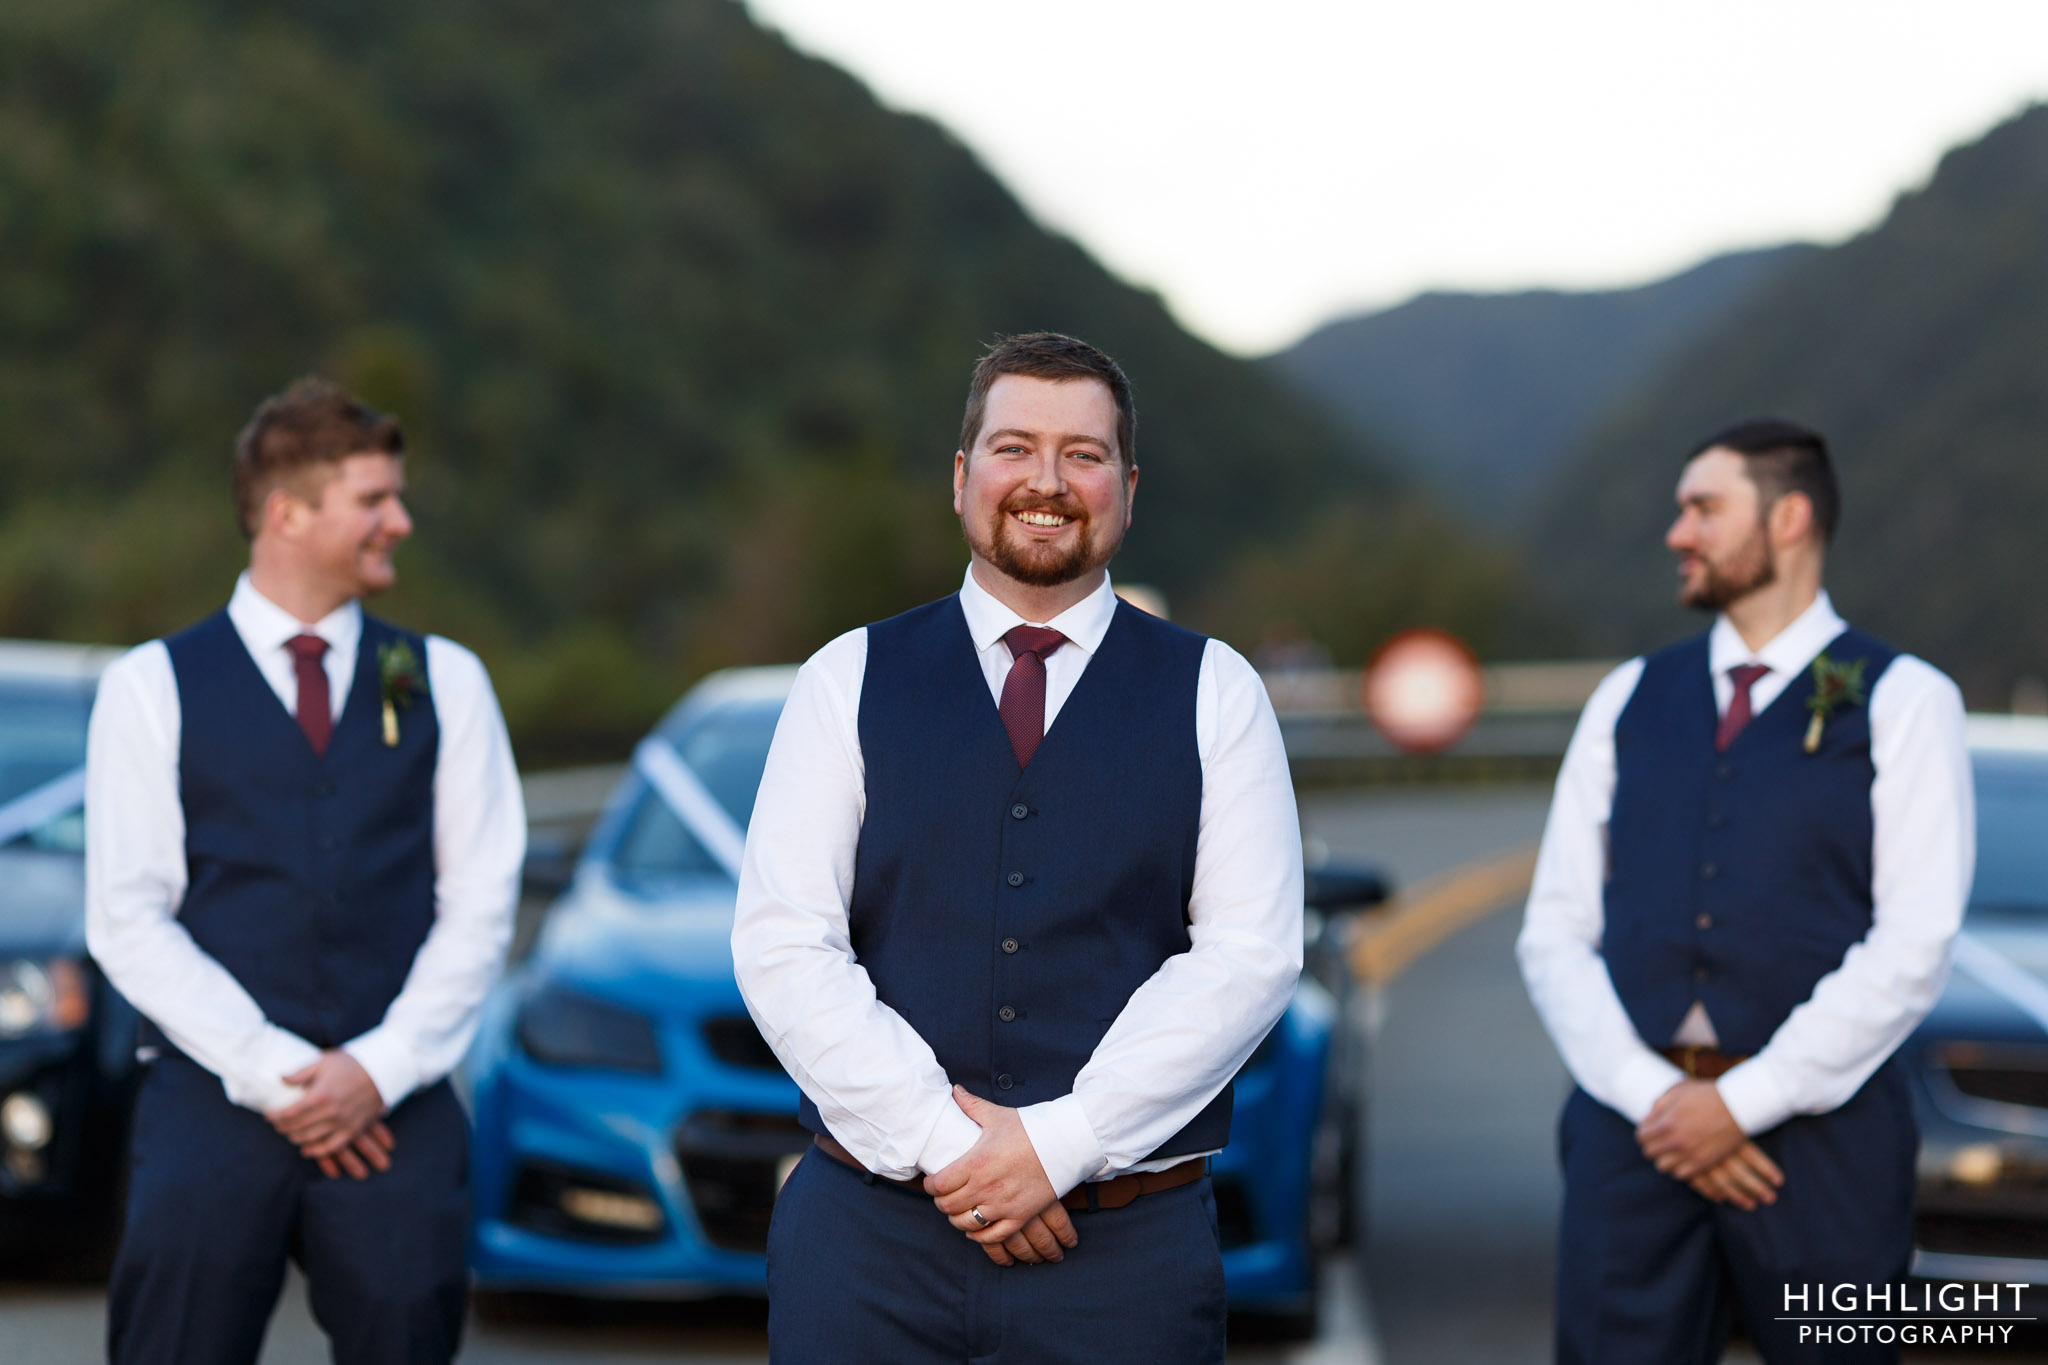 Highlight-wedding-photography-new-zealand-palmerston-north-93.jpg